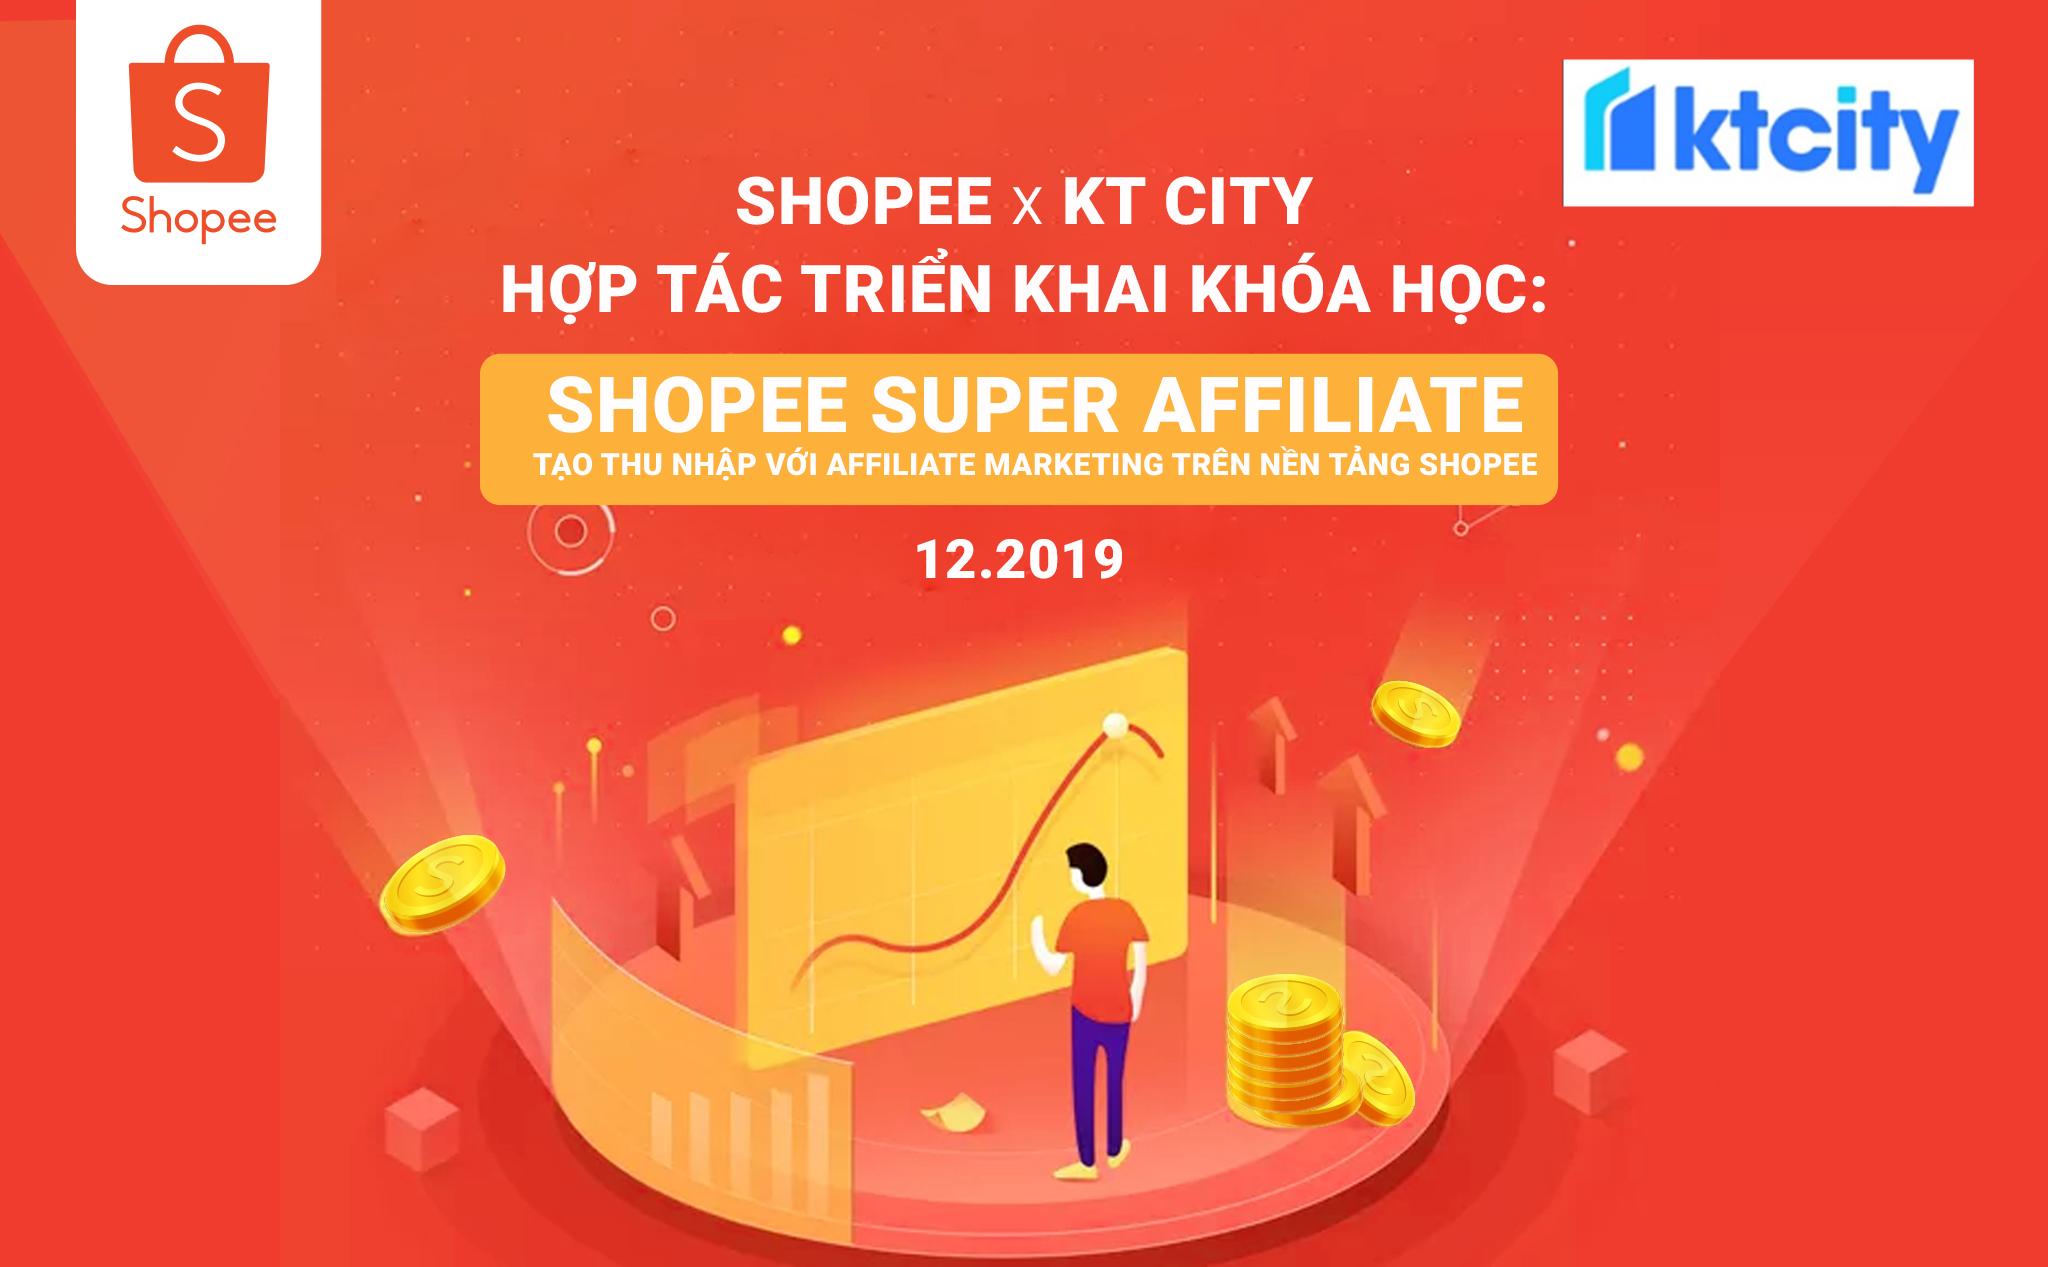 Khoa hoc Affiliate Shopee - KT City